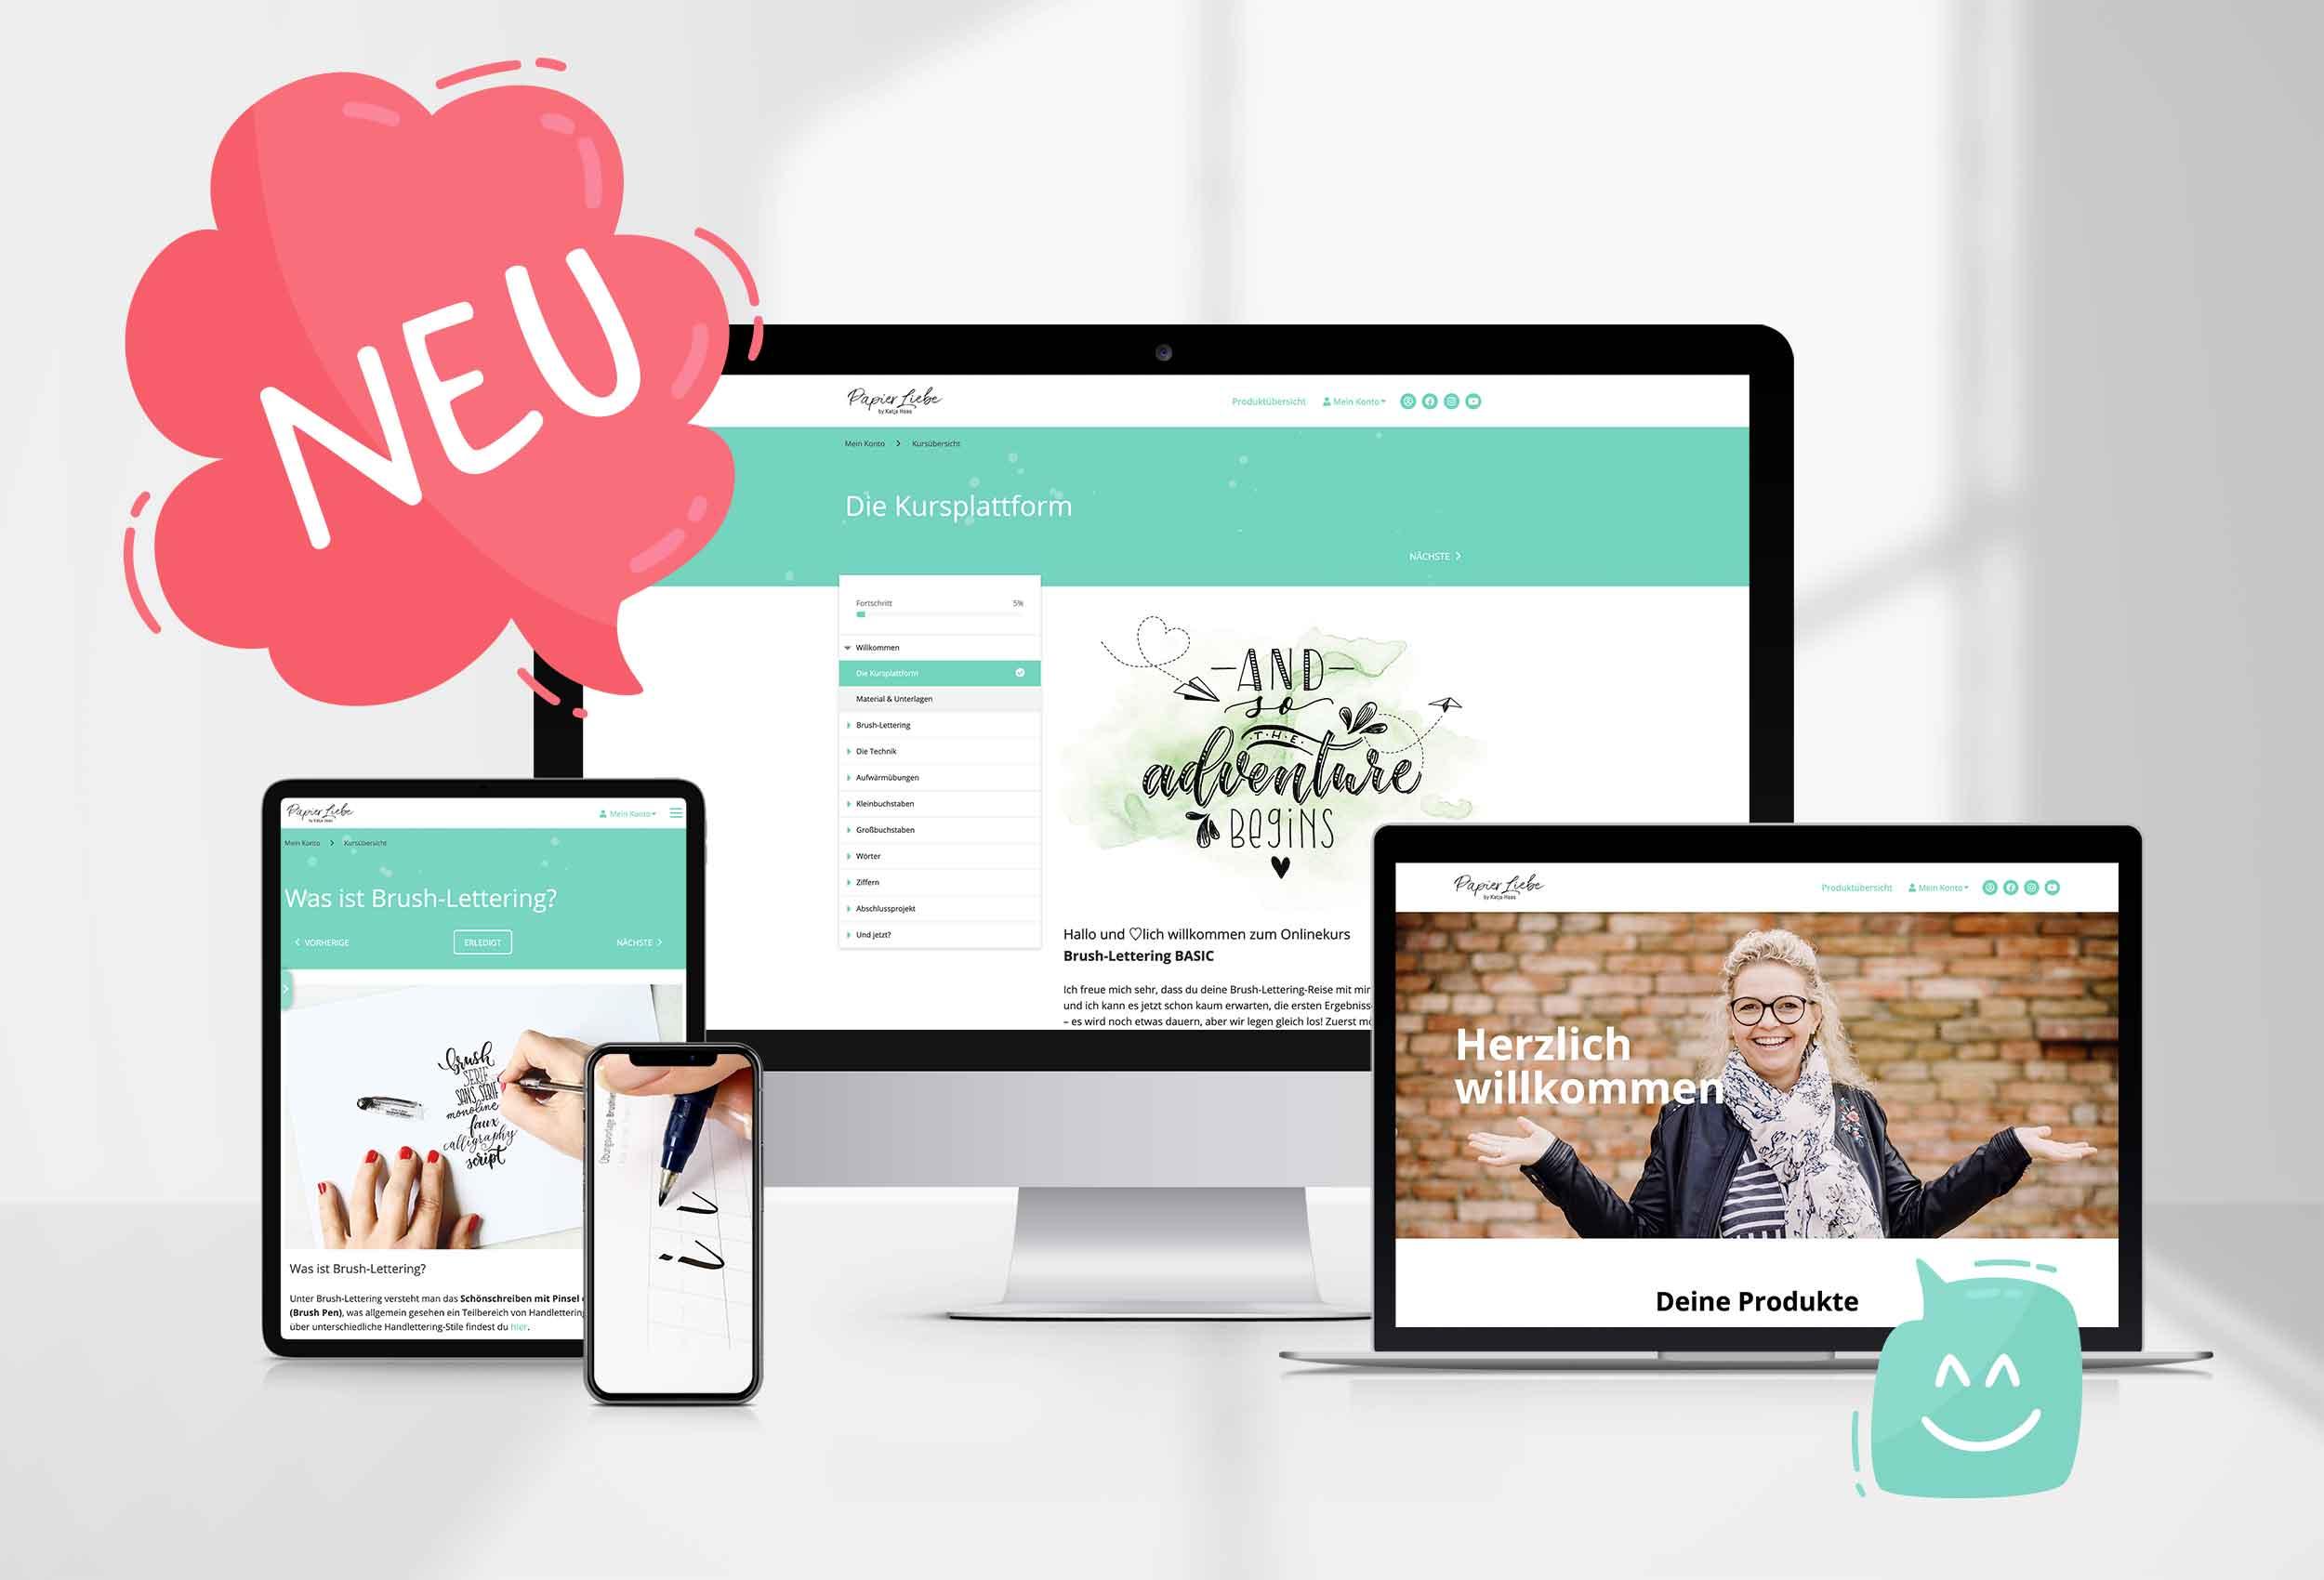 Onlinekurs Brush-Lettering BASIC mit Katja Haas PapierLiebe